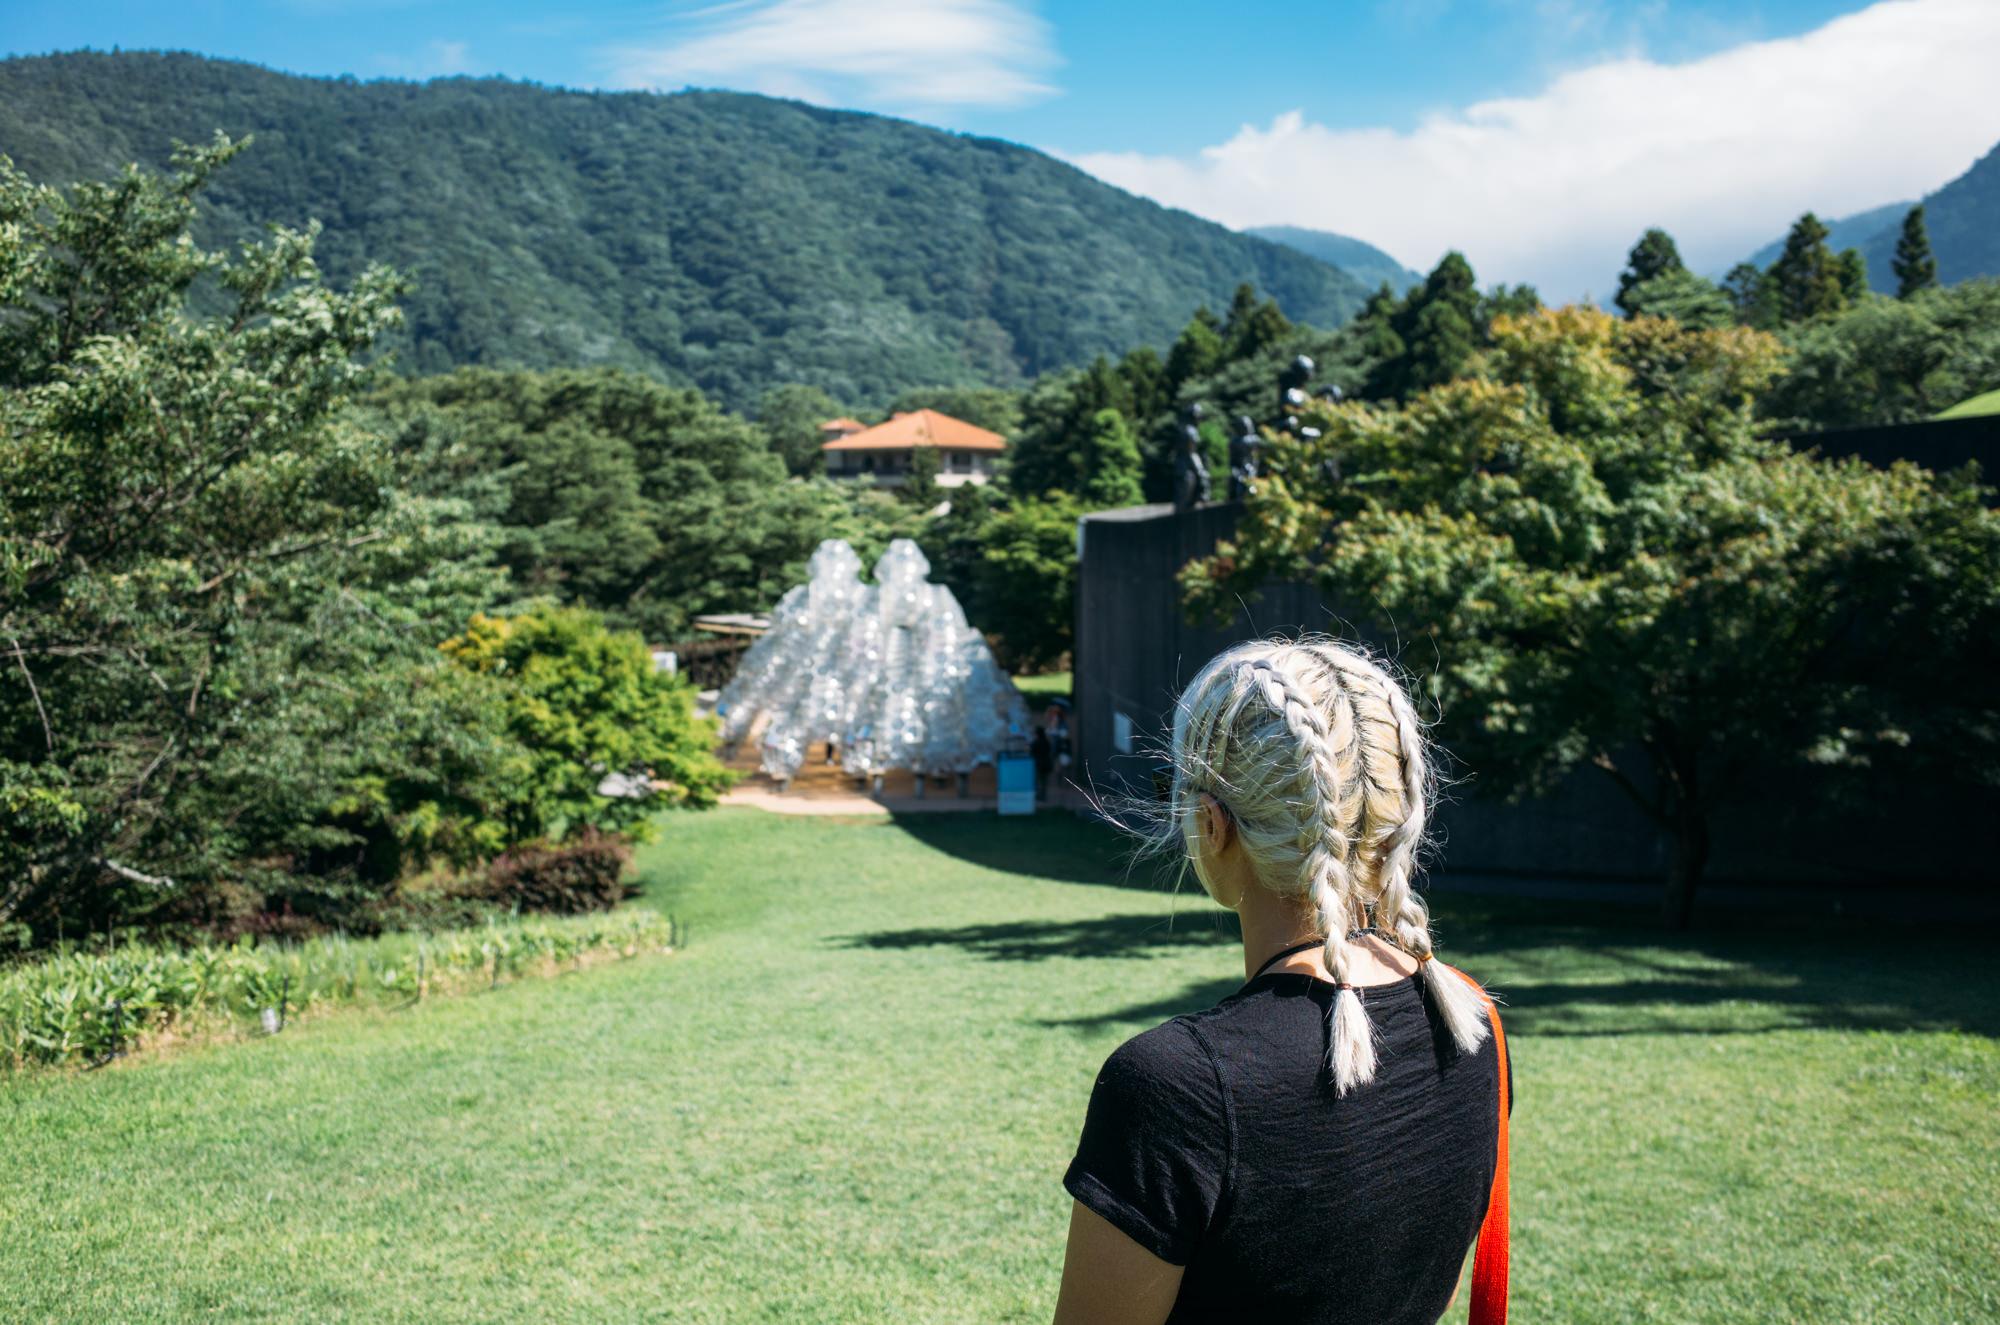 wrenee-hakone-open-air-museum--japan-30.jpg